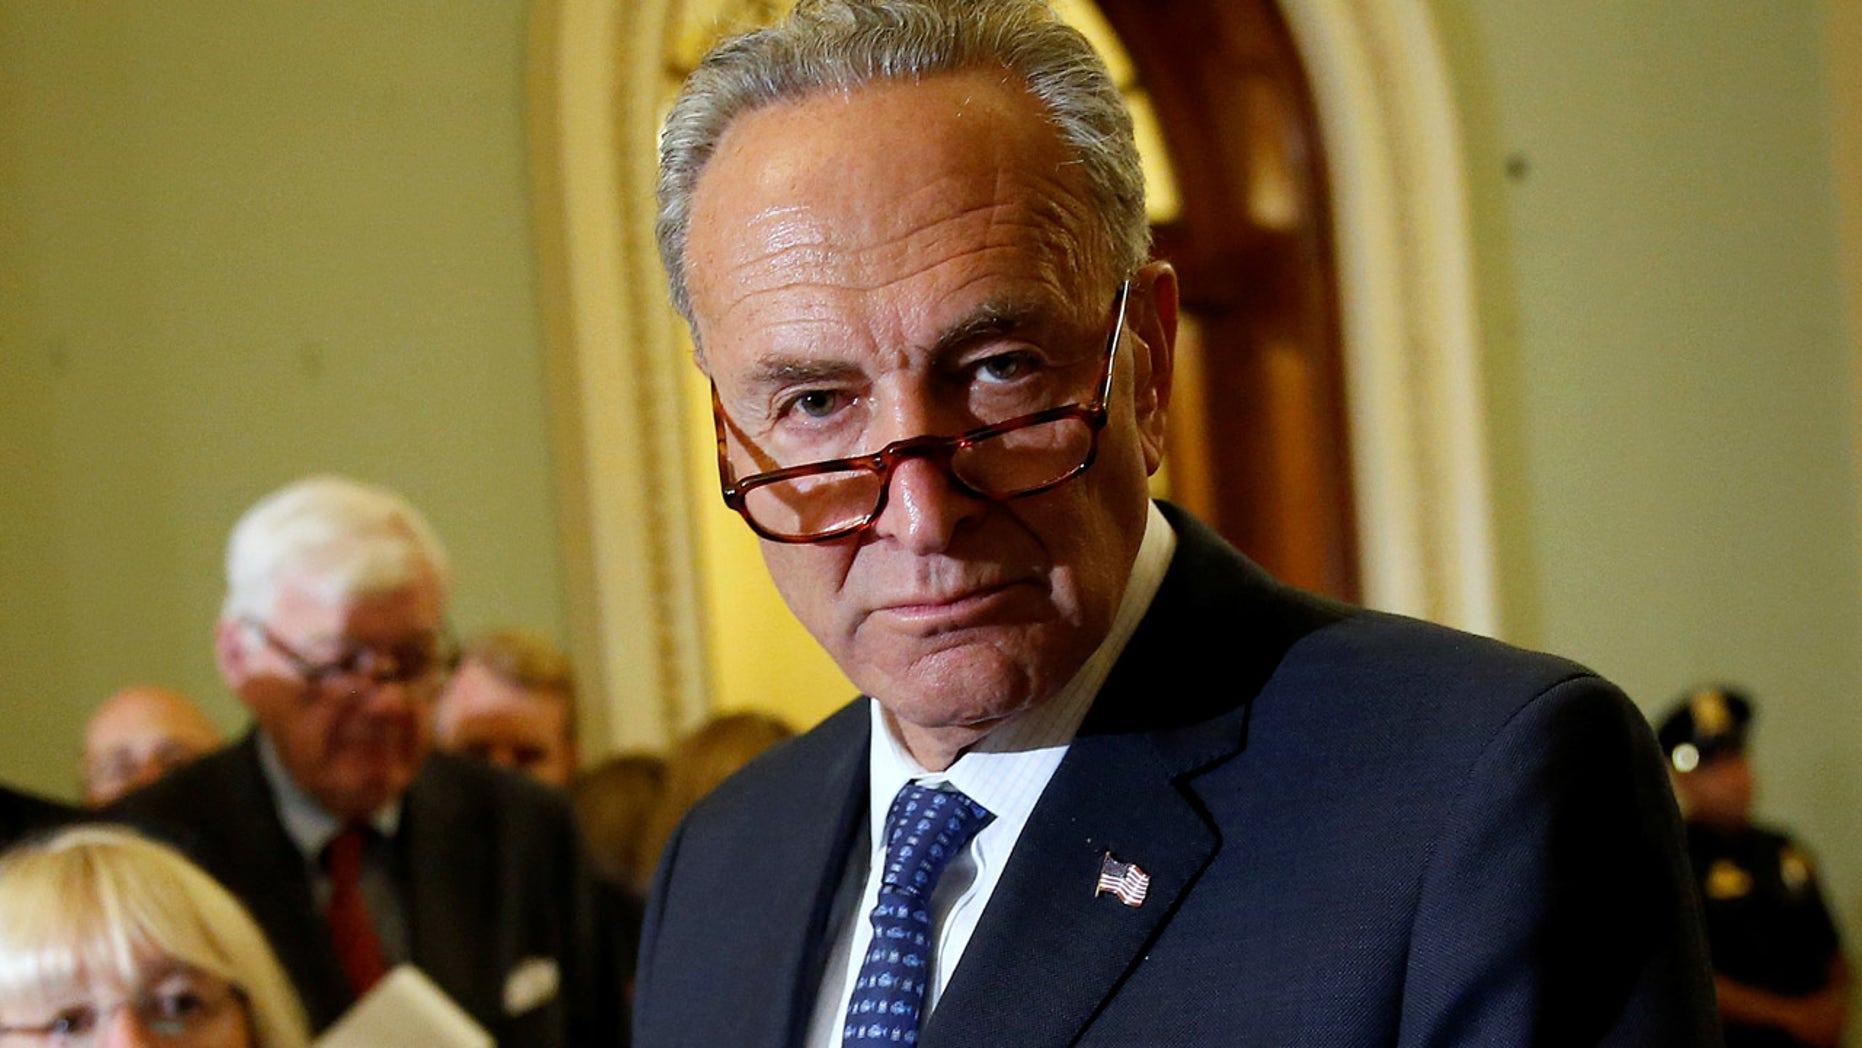 FILE: Senate Minority Leader Chuck Schumer in Washington last week.